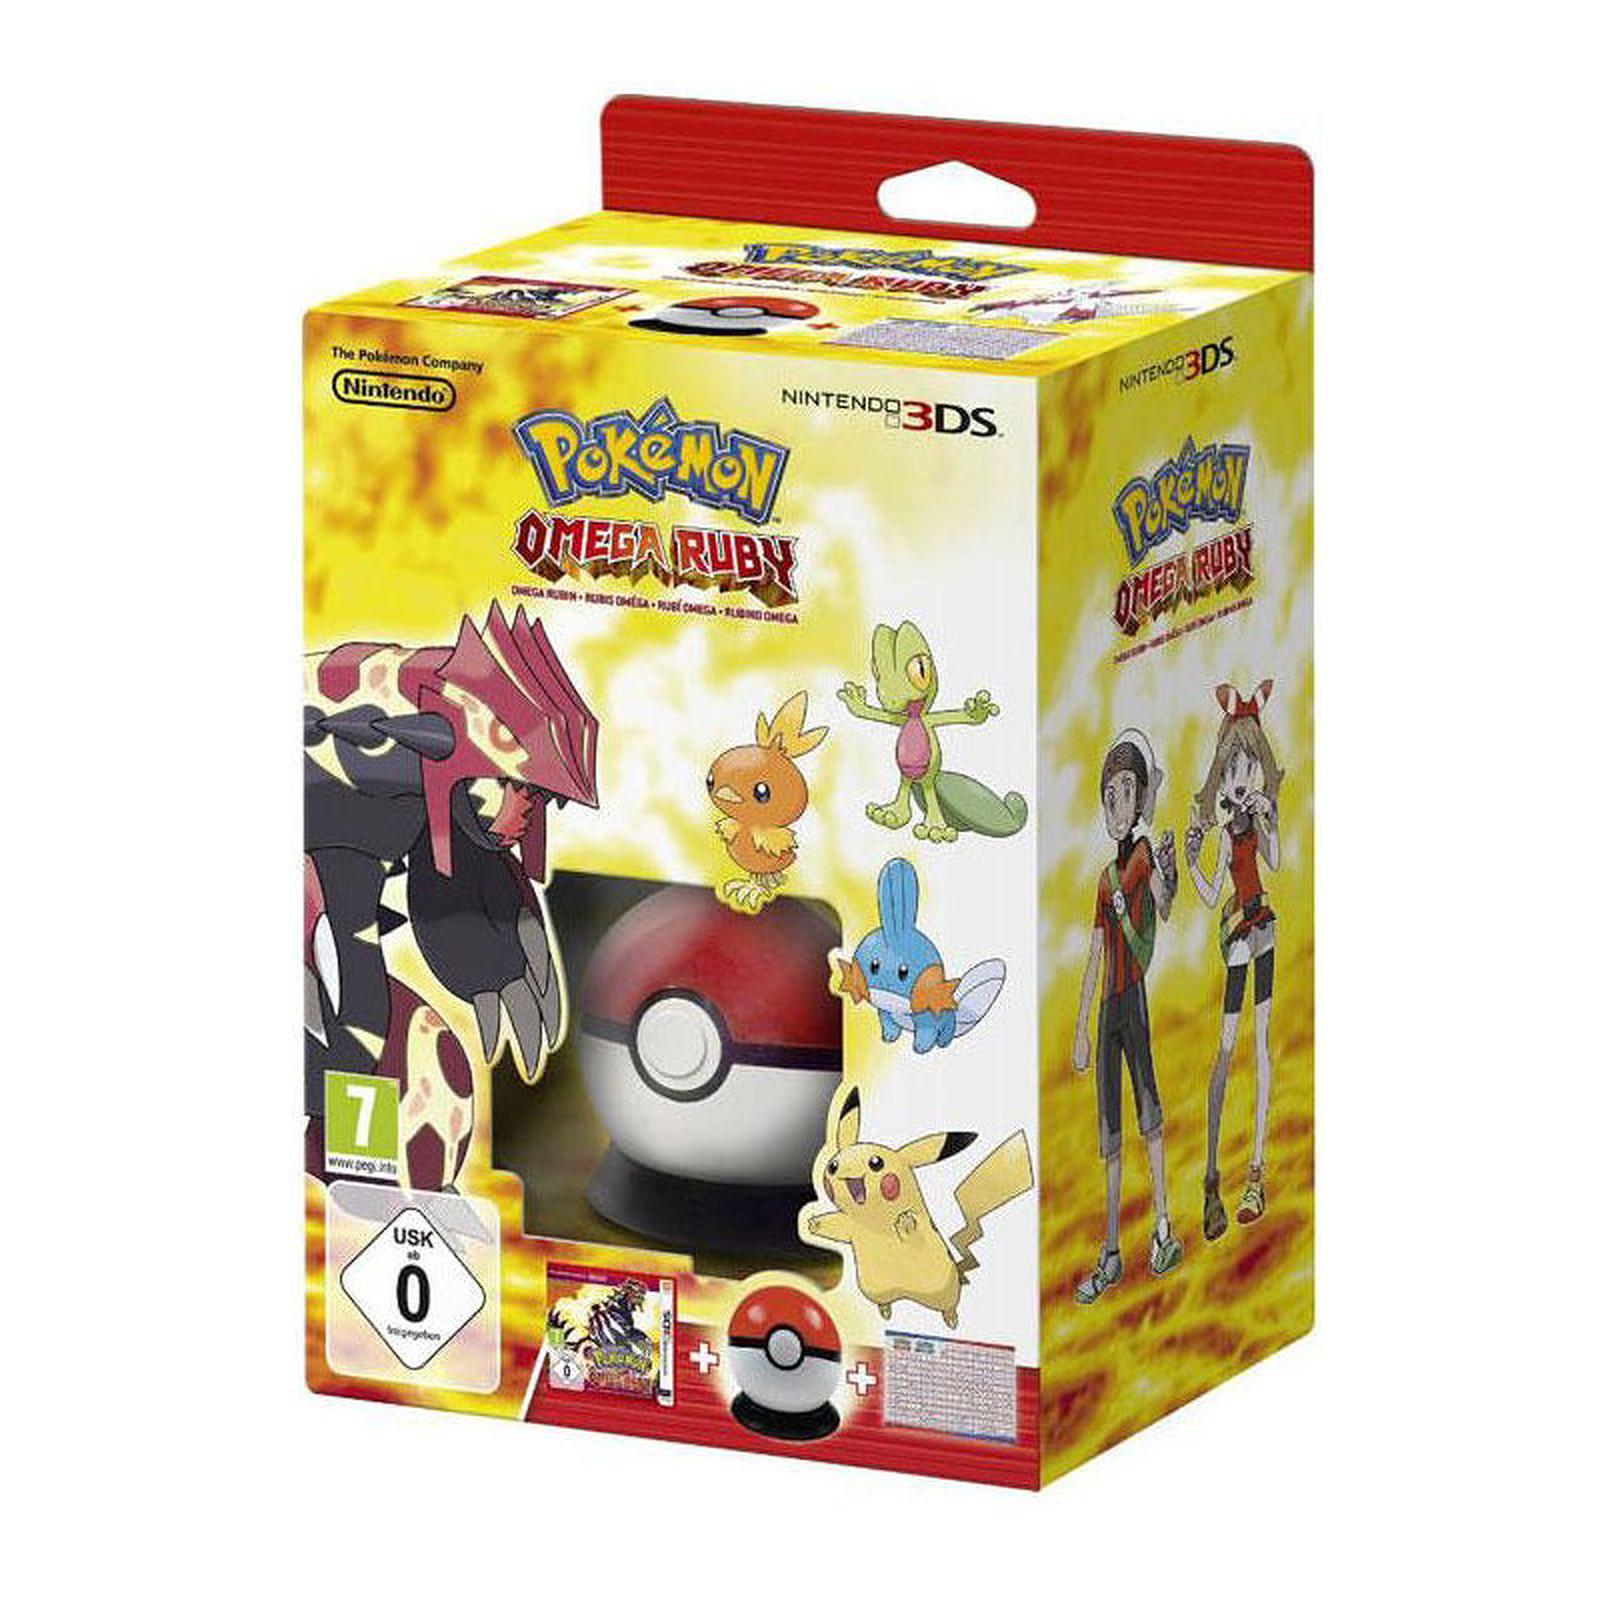 Pokémon : Rubis Oméga + Pokeball + Poster (Nintendo 3DS/2DS)